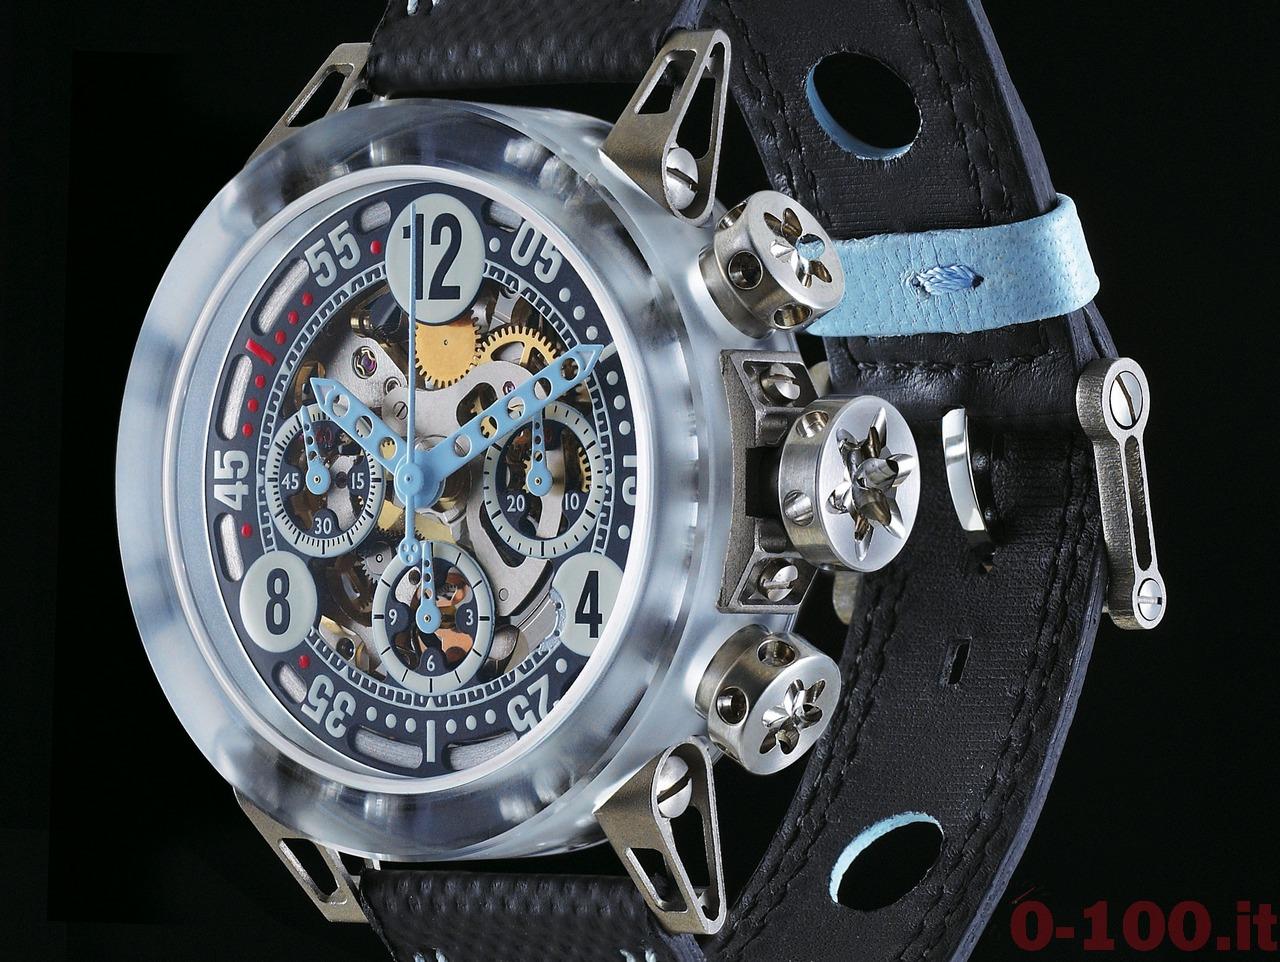 brm-mk-44-prezzo-price_0-1002